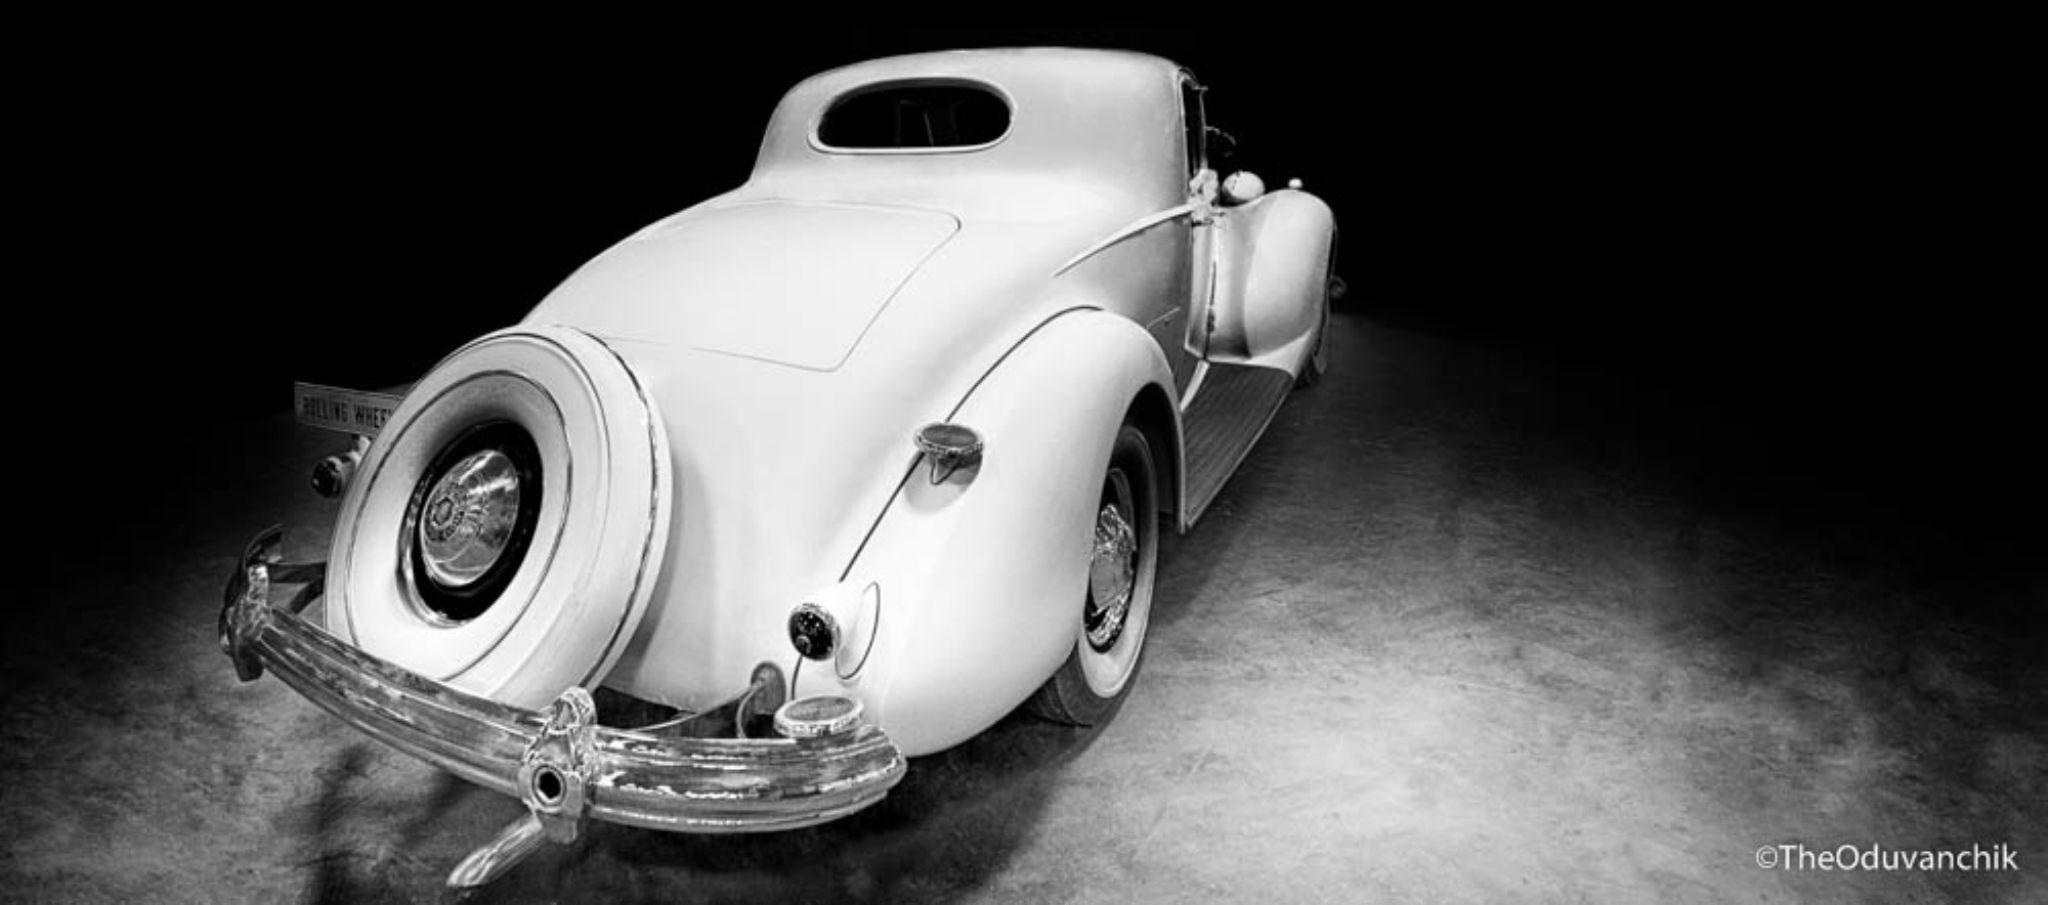 B&W Packard Super Eight by theoduvanchik